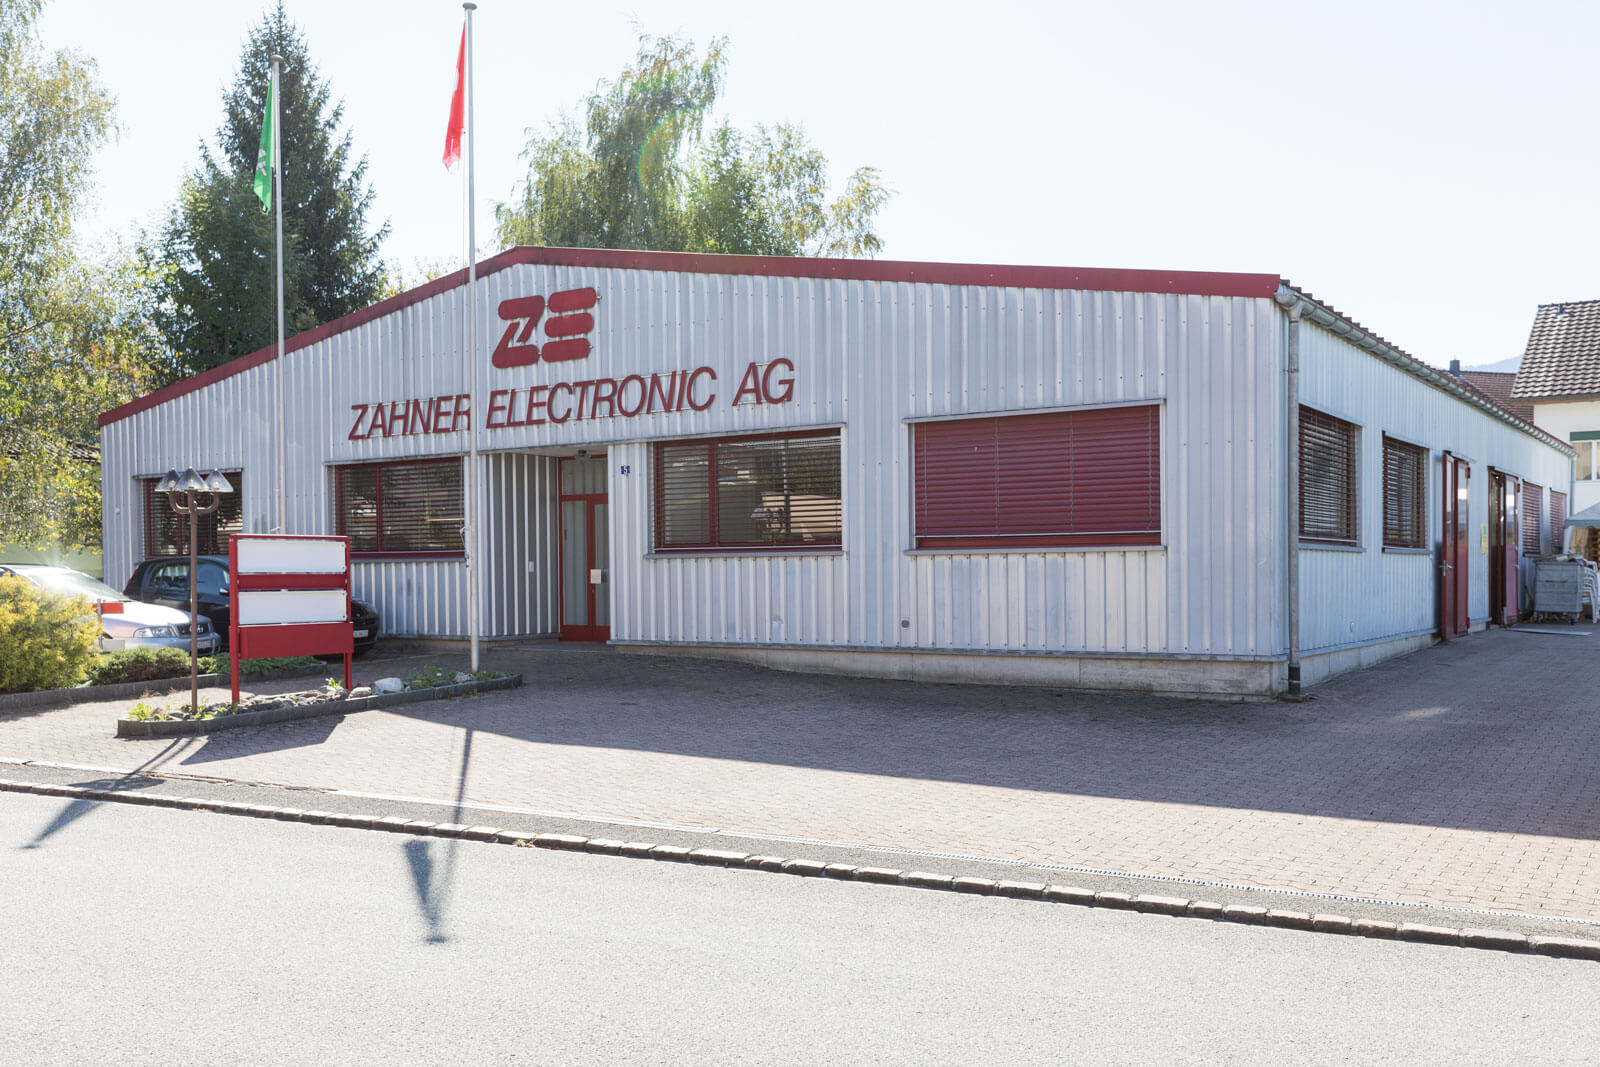 zahner_electronic_anlagenbau_5